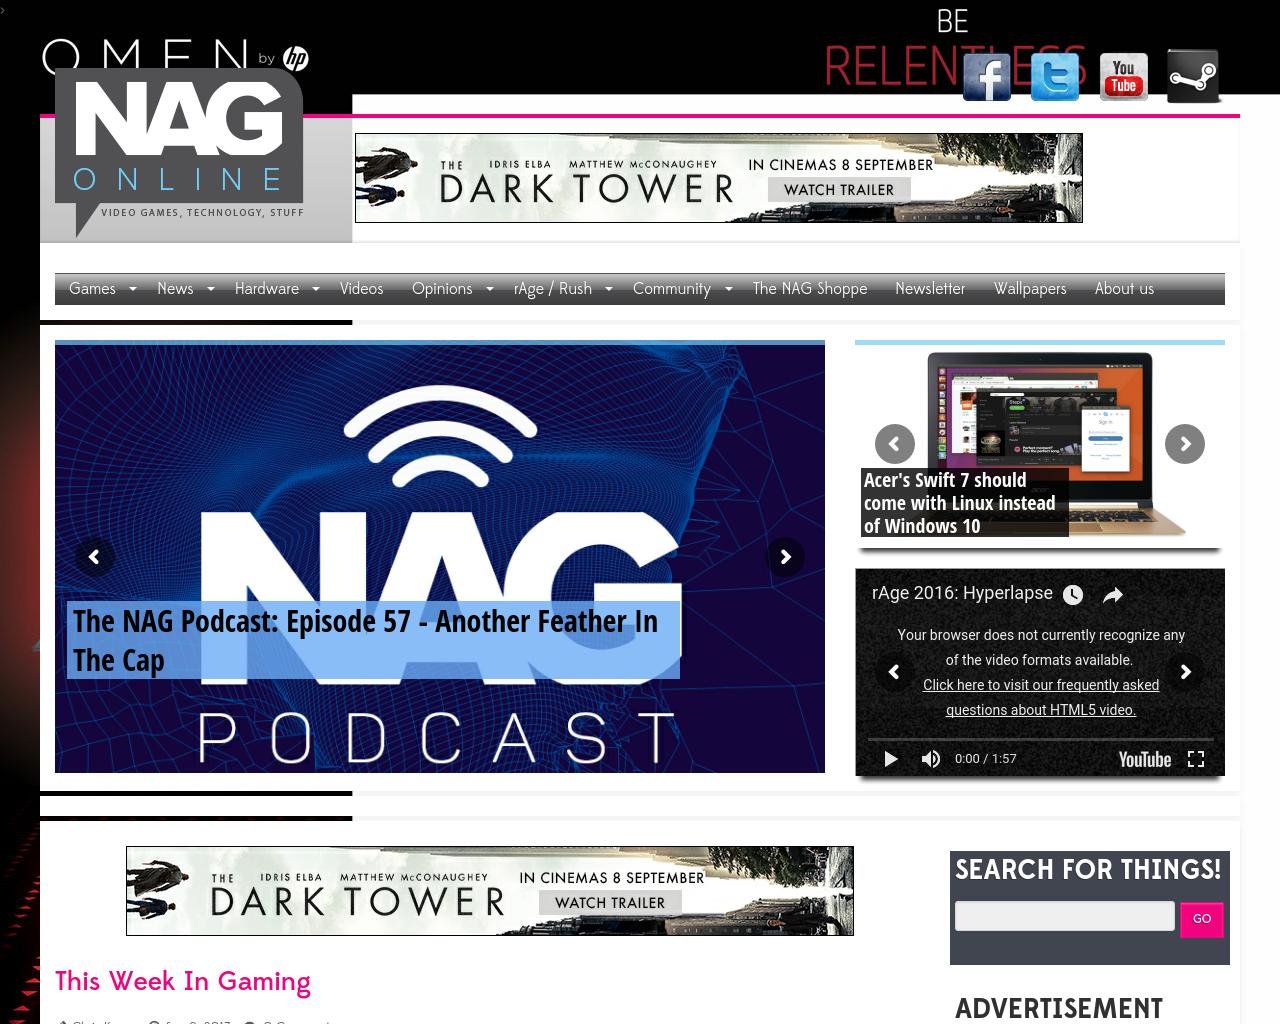 NAG-Online-Advertising-Reviews-Pricing